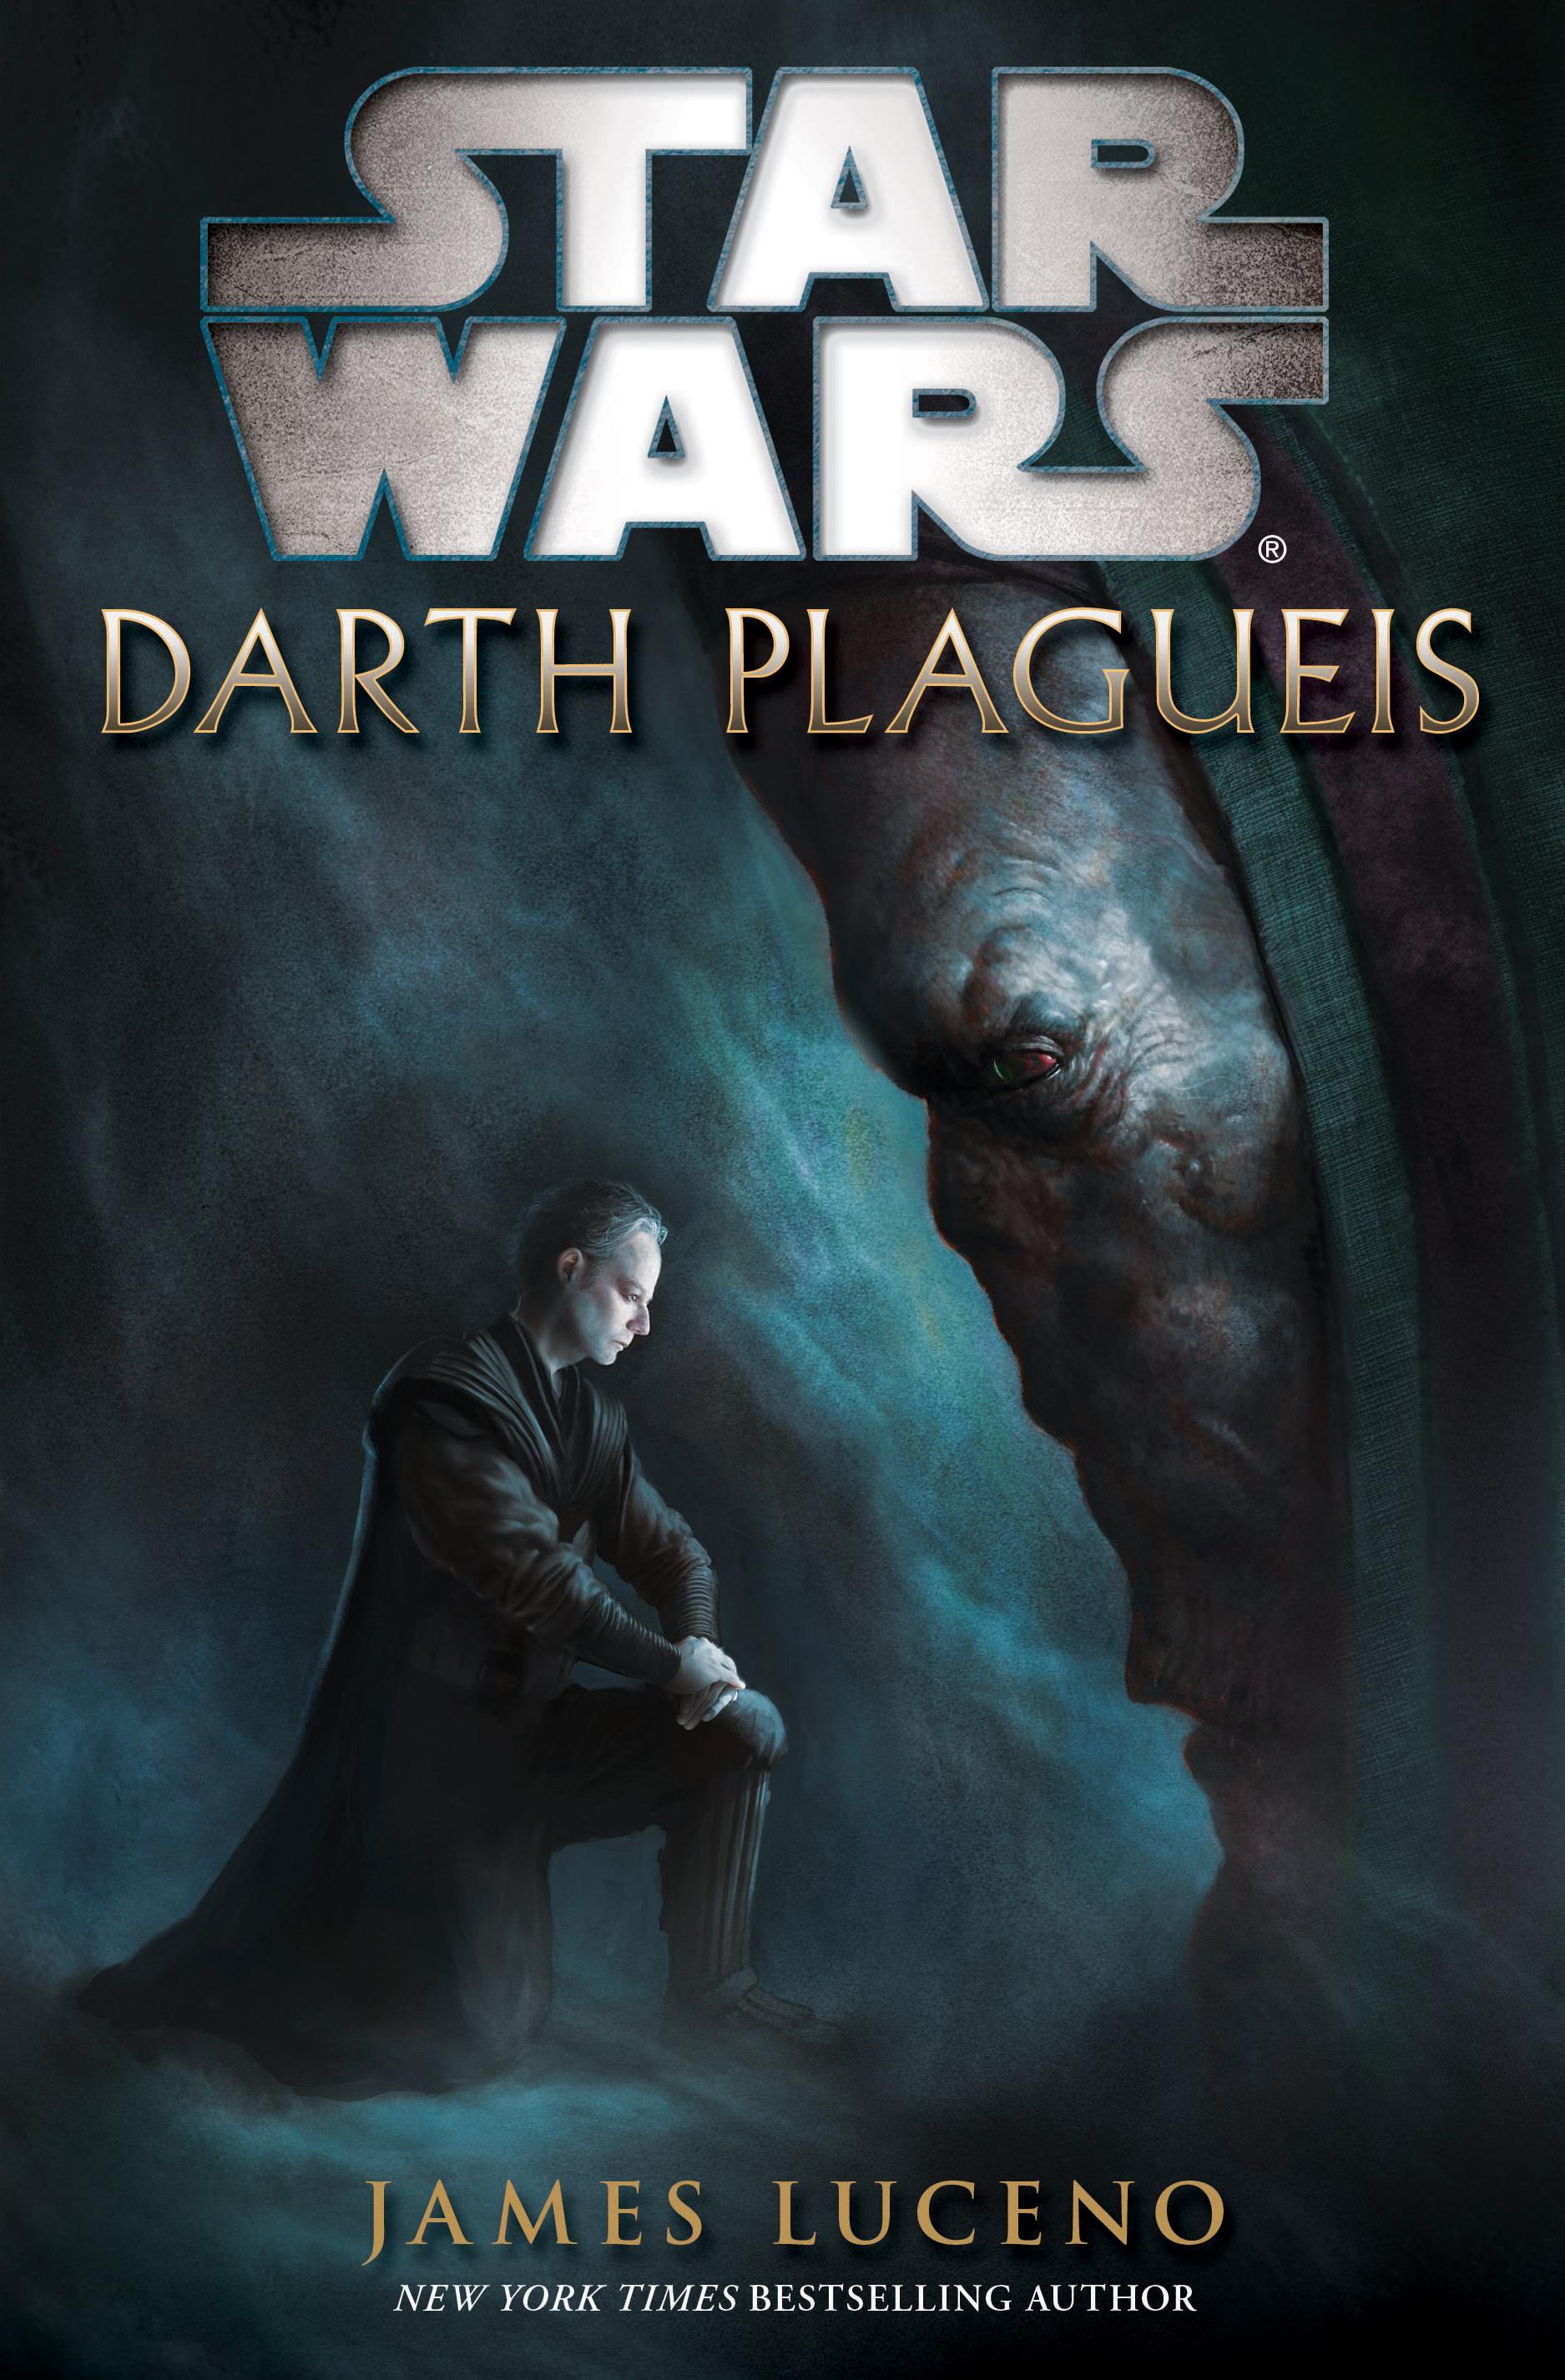 James Luceno - Star Wars: Darth Plagueis - £1.99 @ Amazon UK (Kindle Edition)